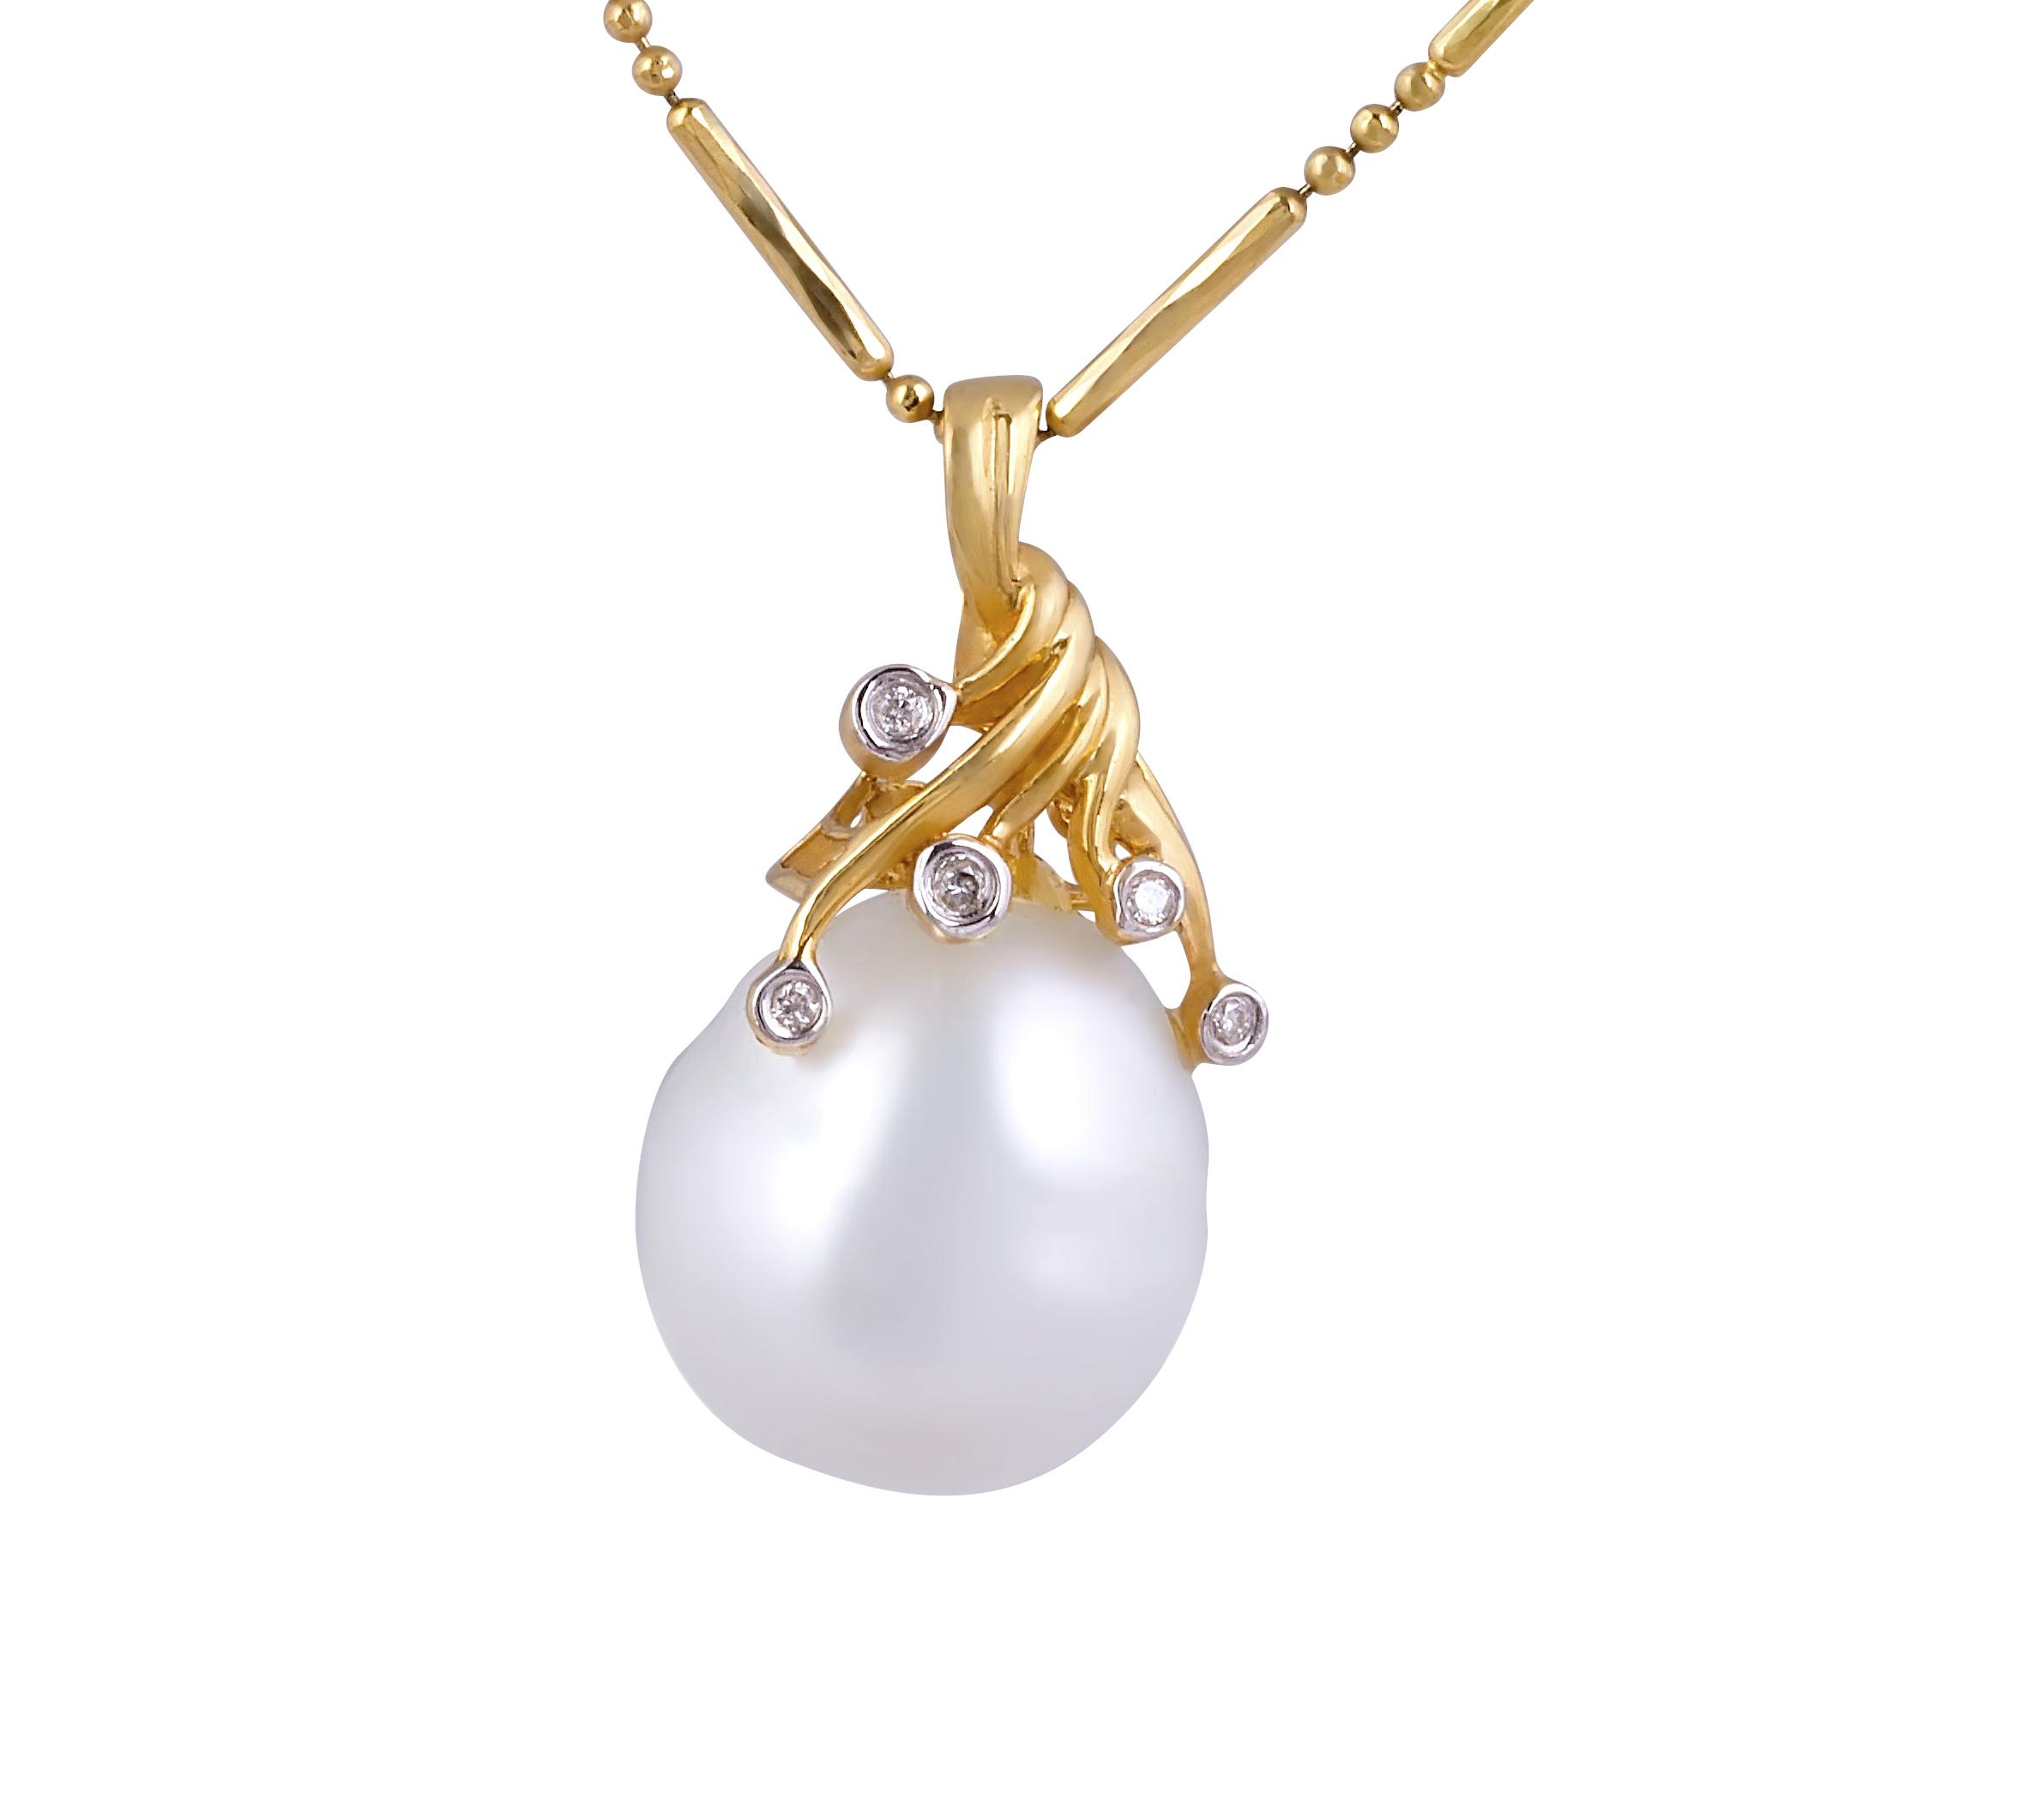 Pearl and Diamond Pendant in 18 Karat Yellow Gold